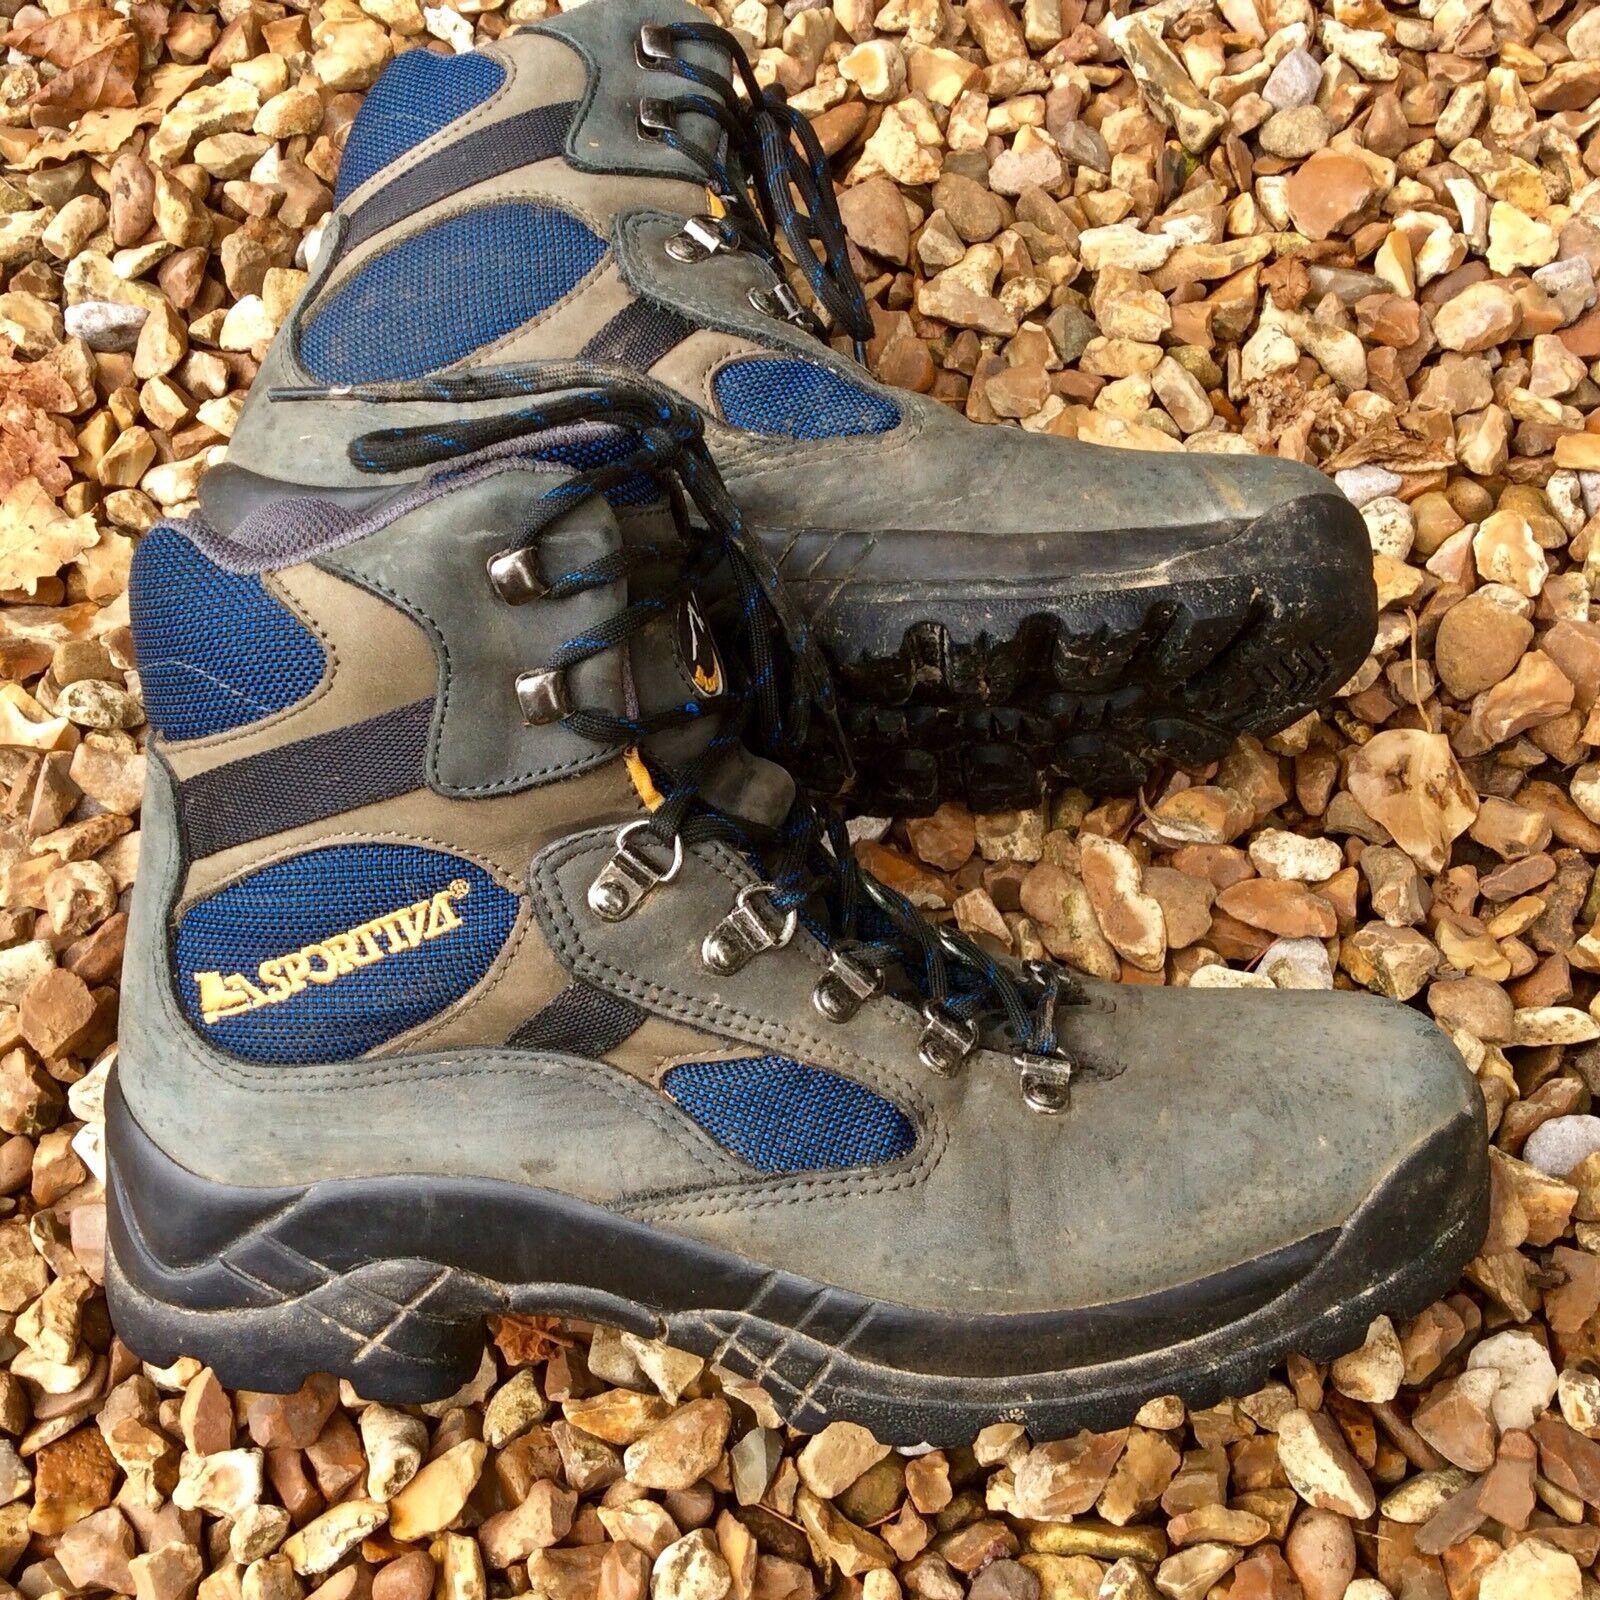 La Sportiva Mountain Hiking Trail Specialist Unisex Stiefel US 9.5 UK 7.5-8